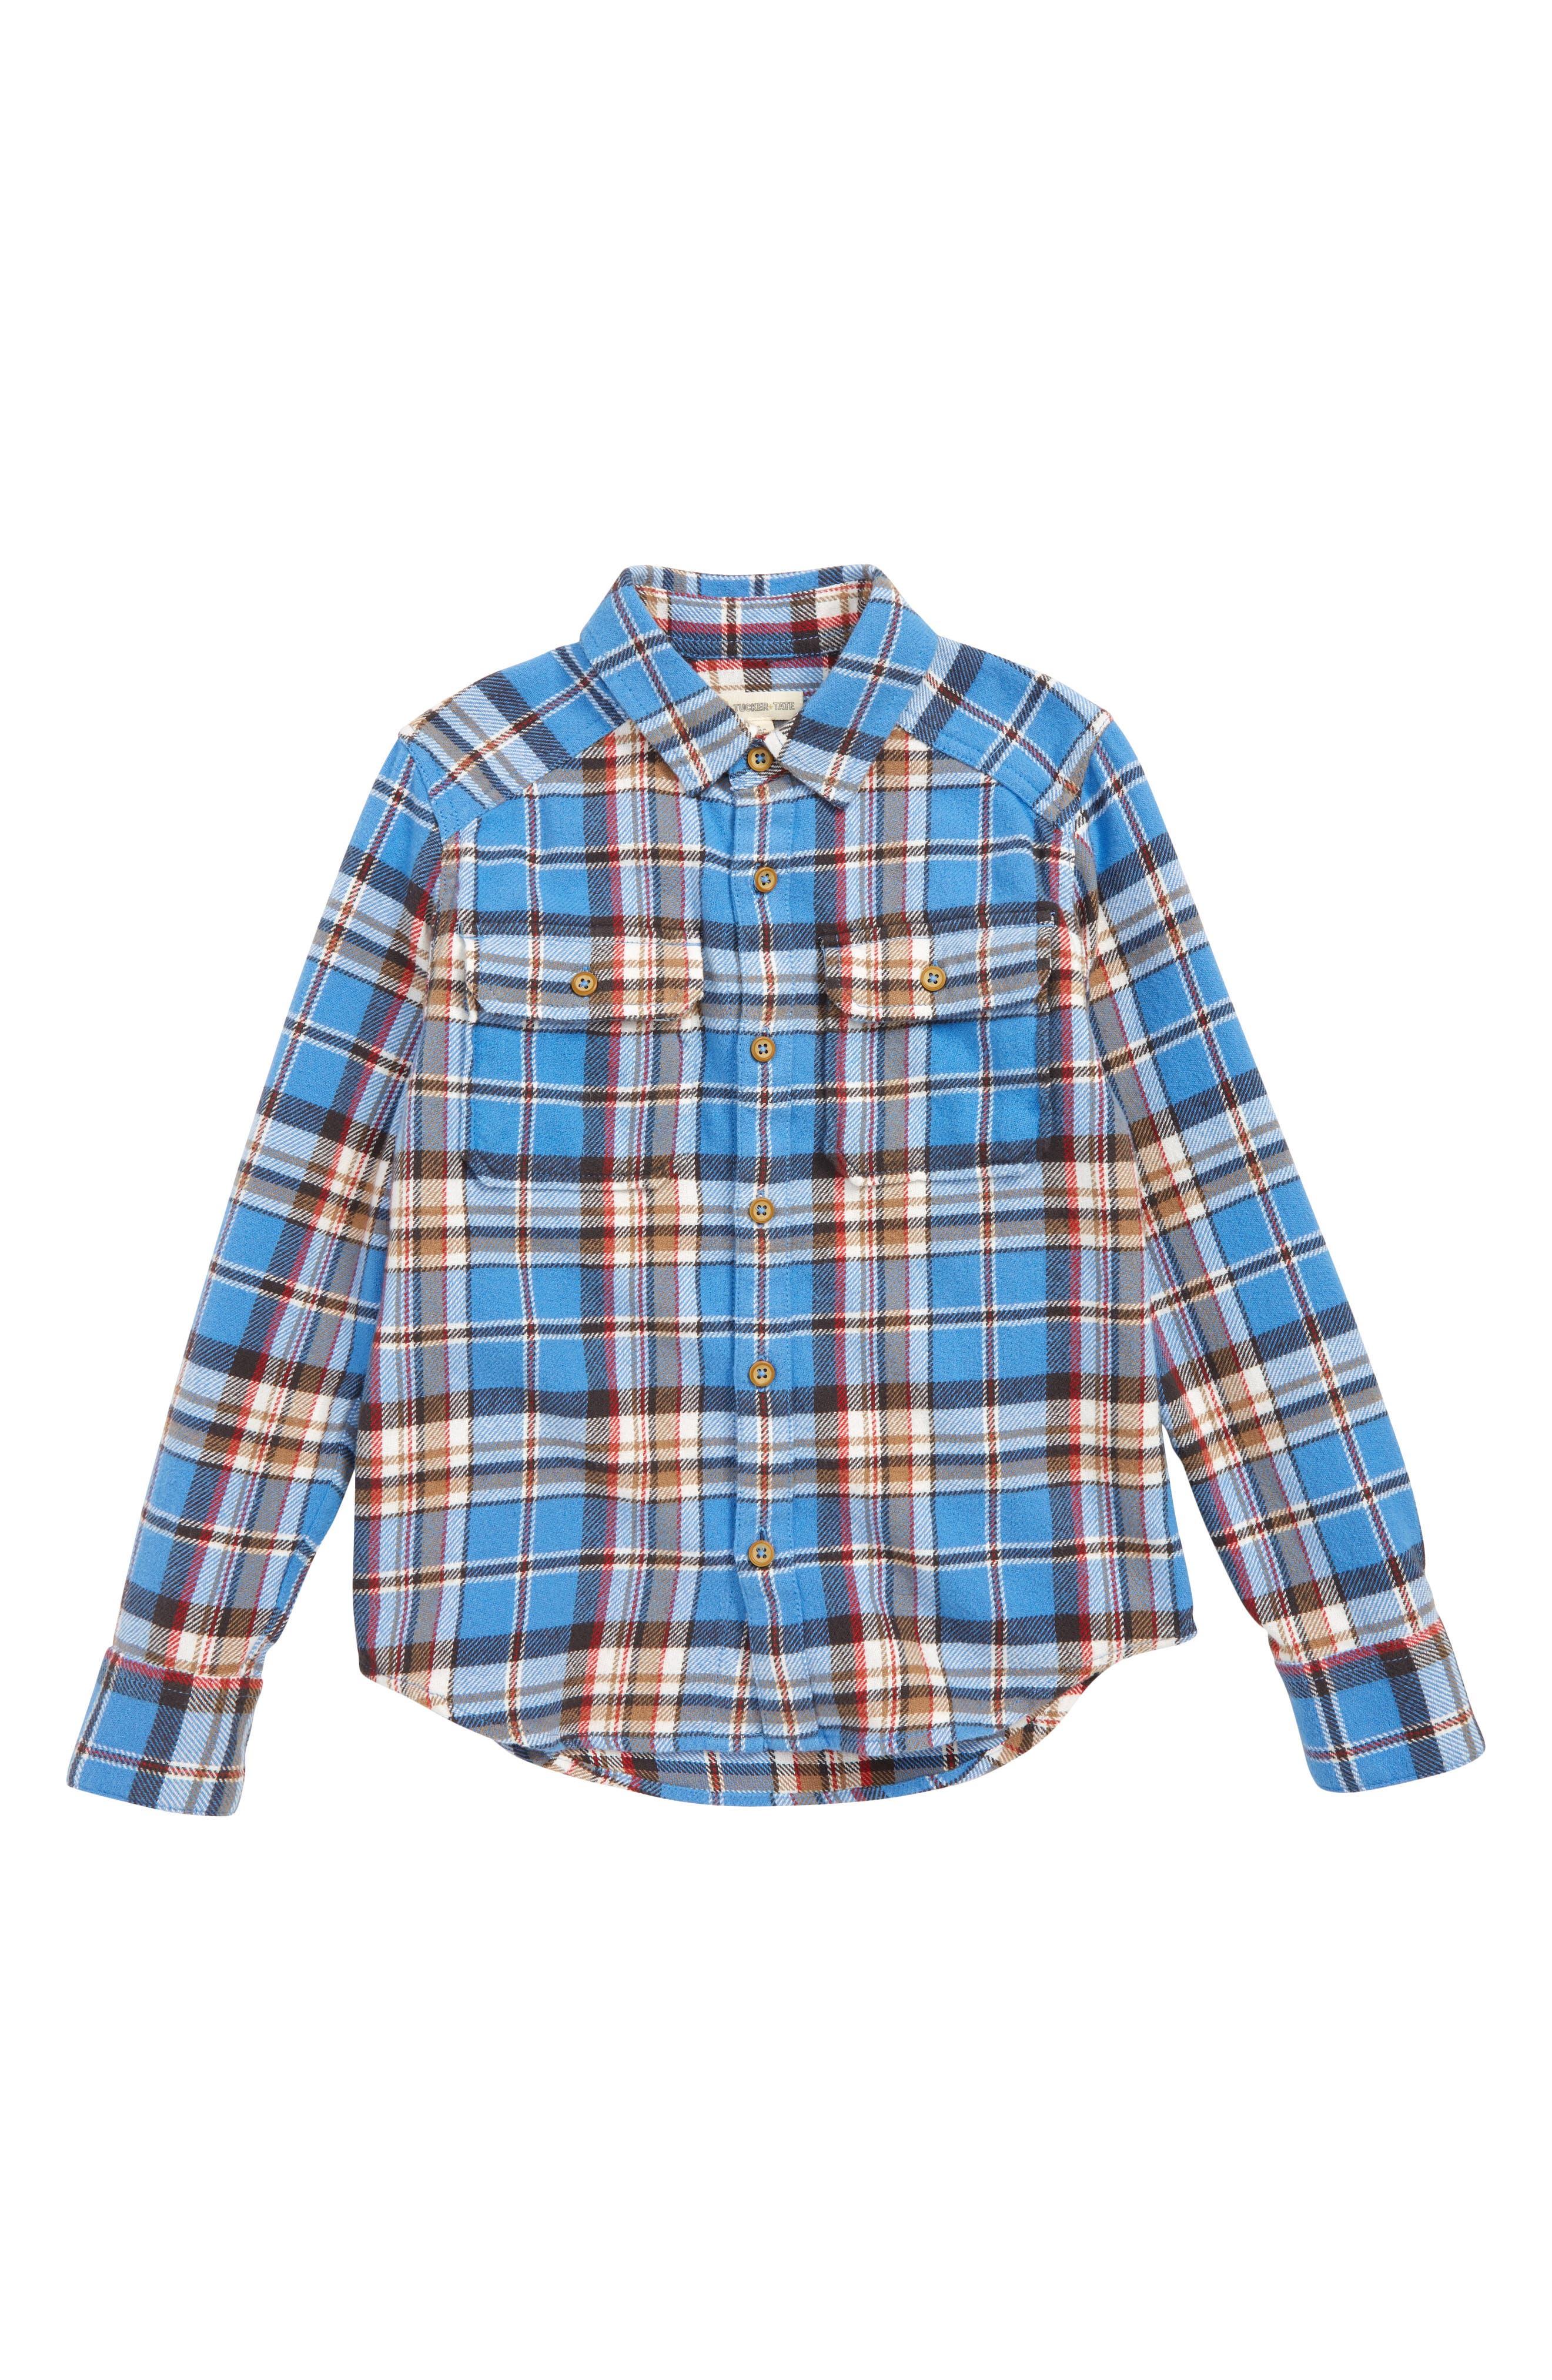 TUCKER + TATE Plaid Flannel Shirt, Main, color, BLUE LAPIS BILLY PLAID